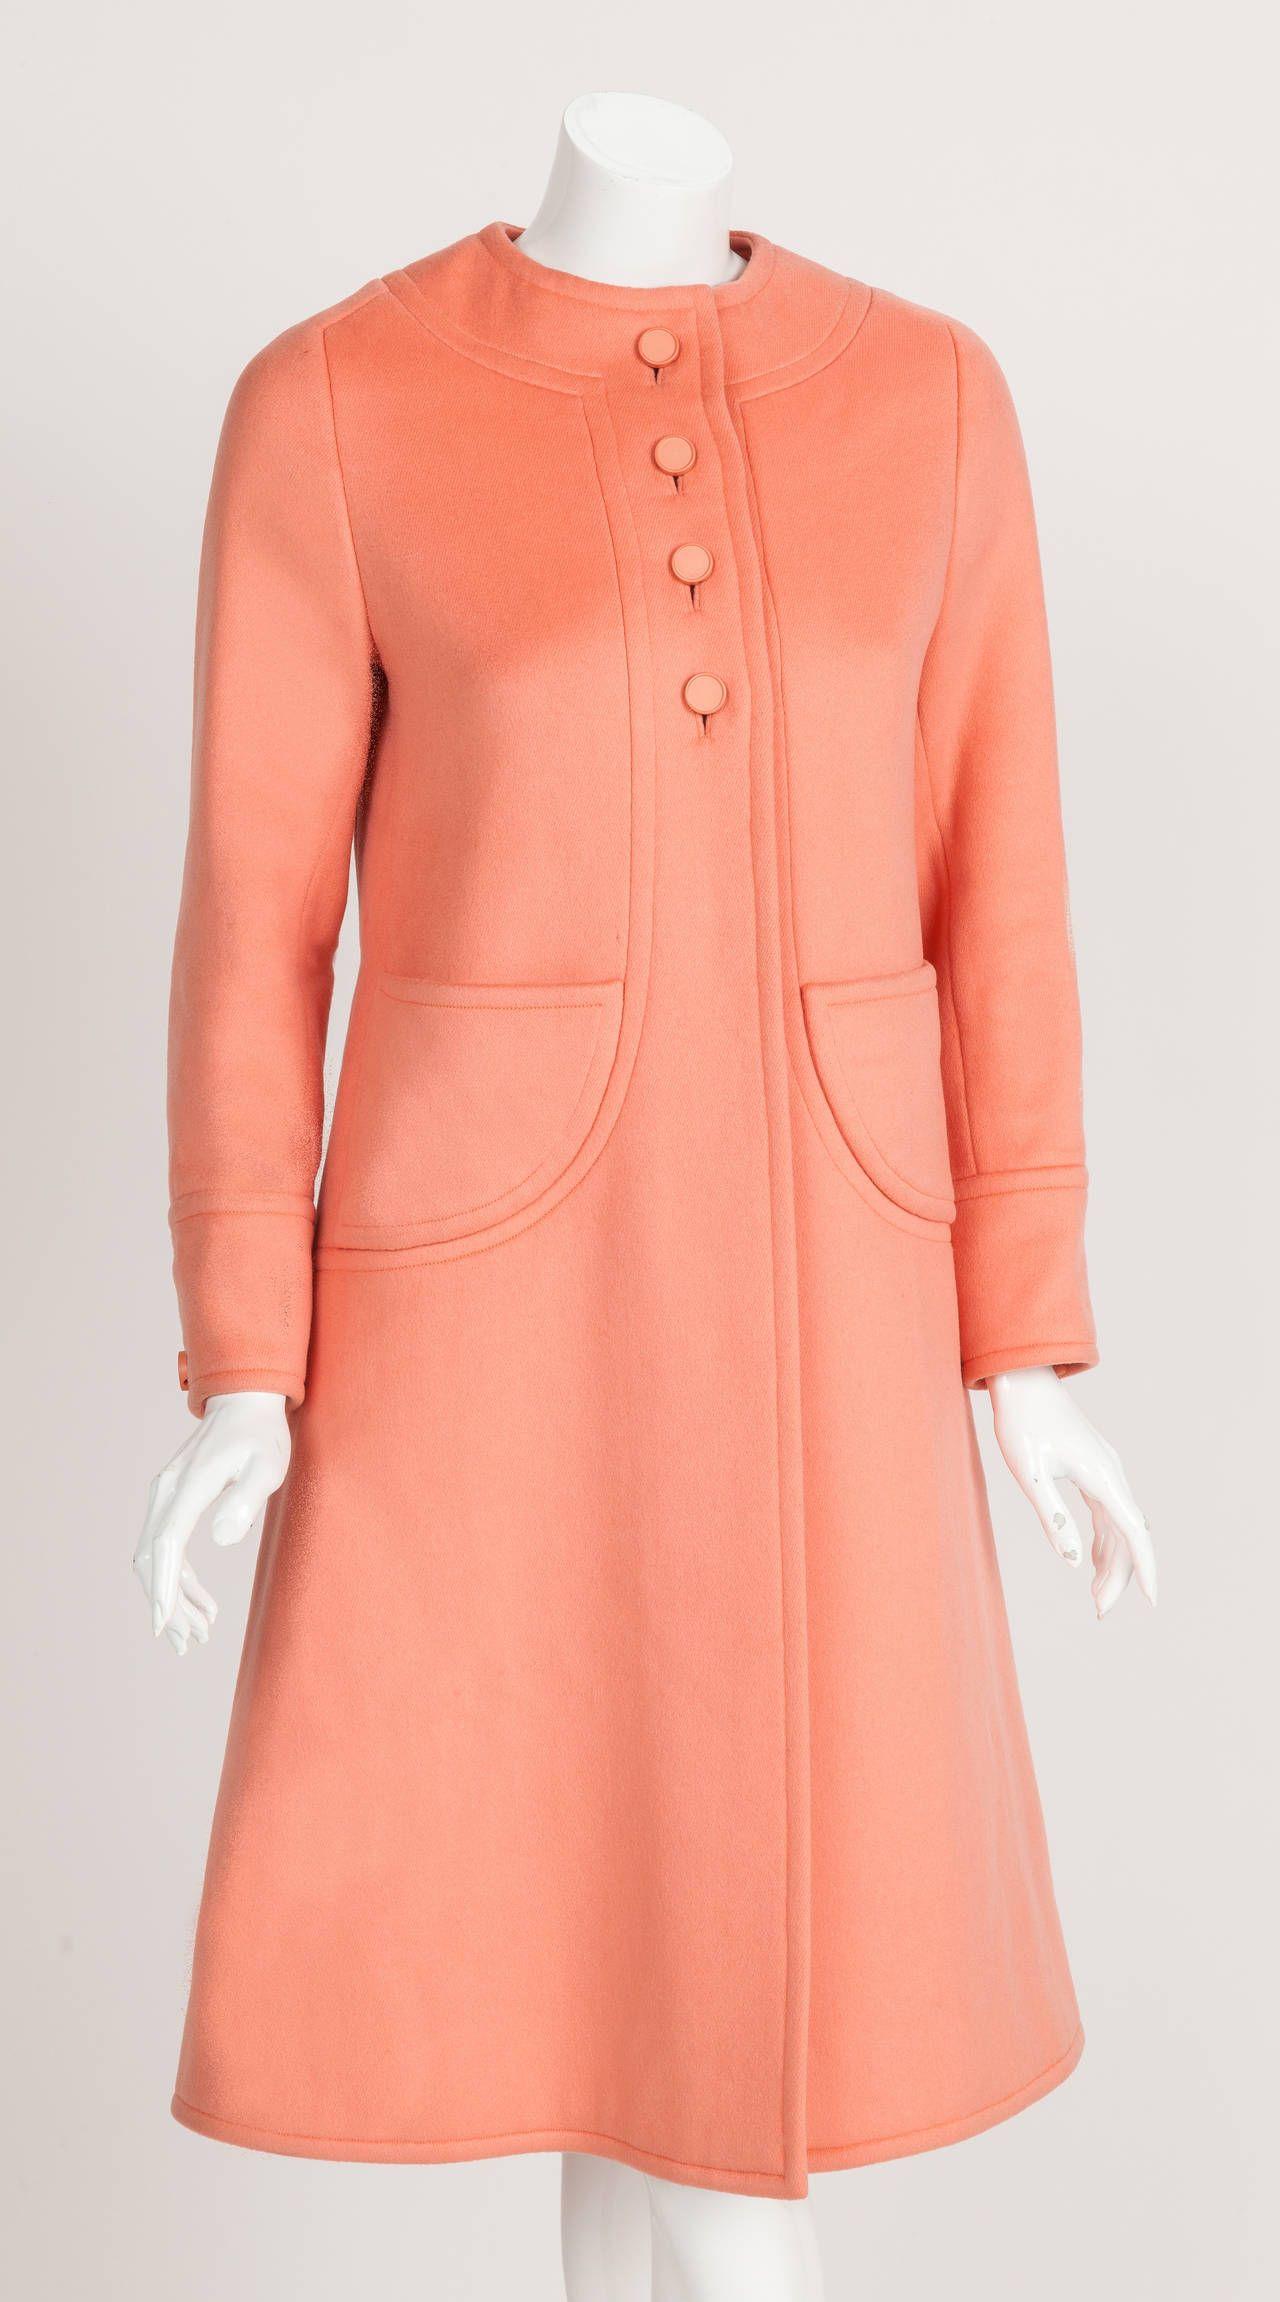 Philippe Venet Haute Couture Melton Wool Coat ca. 1970 image 2